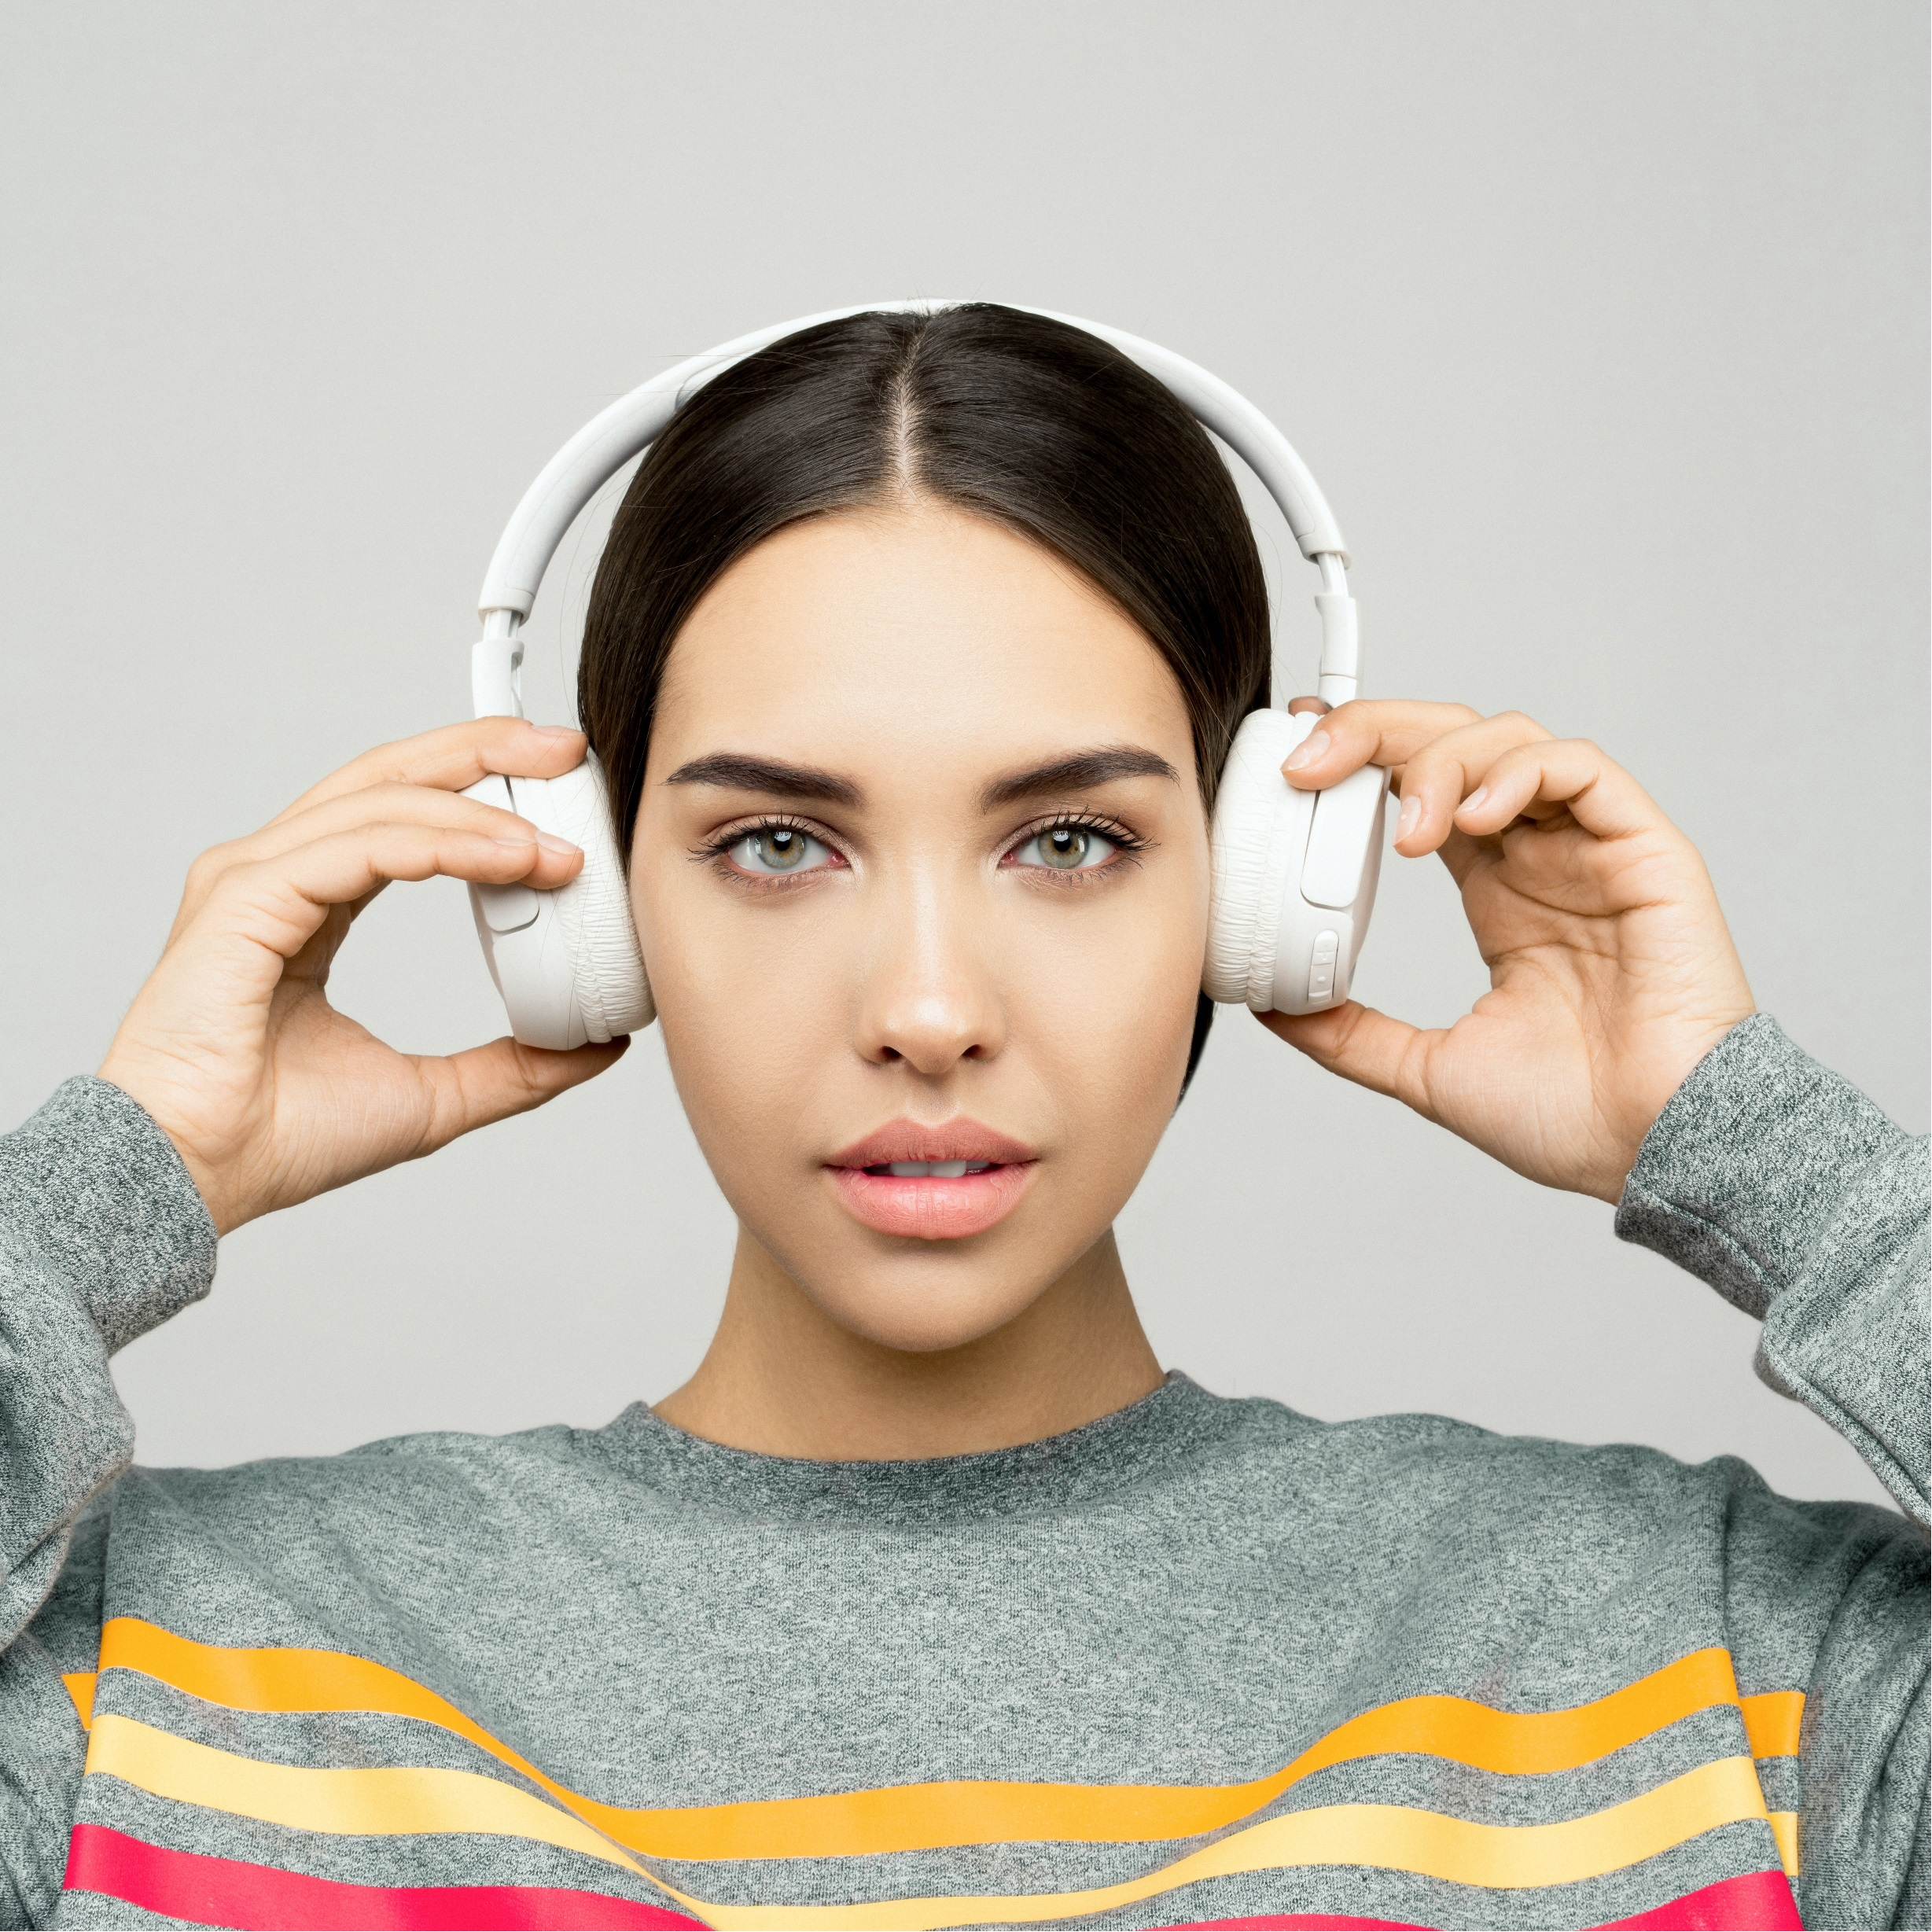 Admin Hacks: A women wearing white headphones.